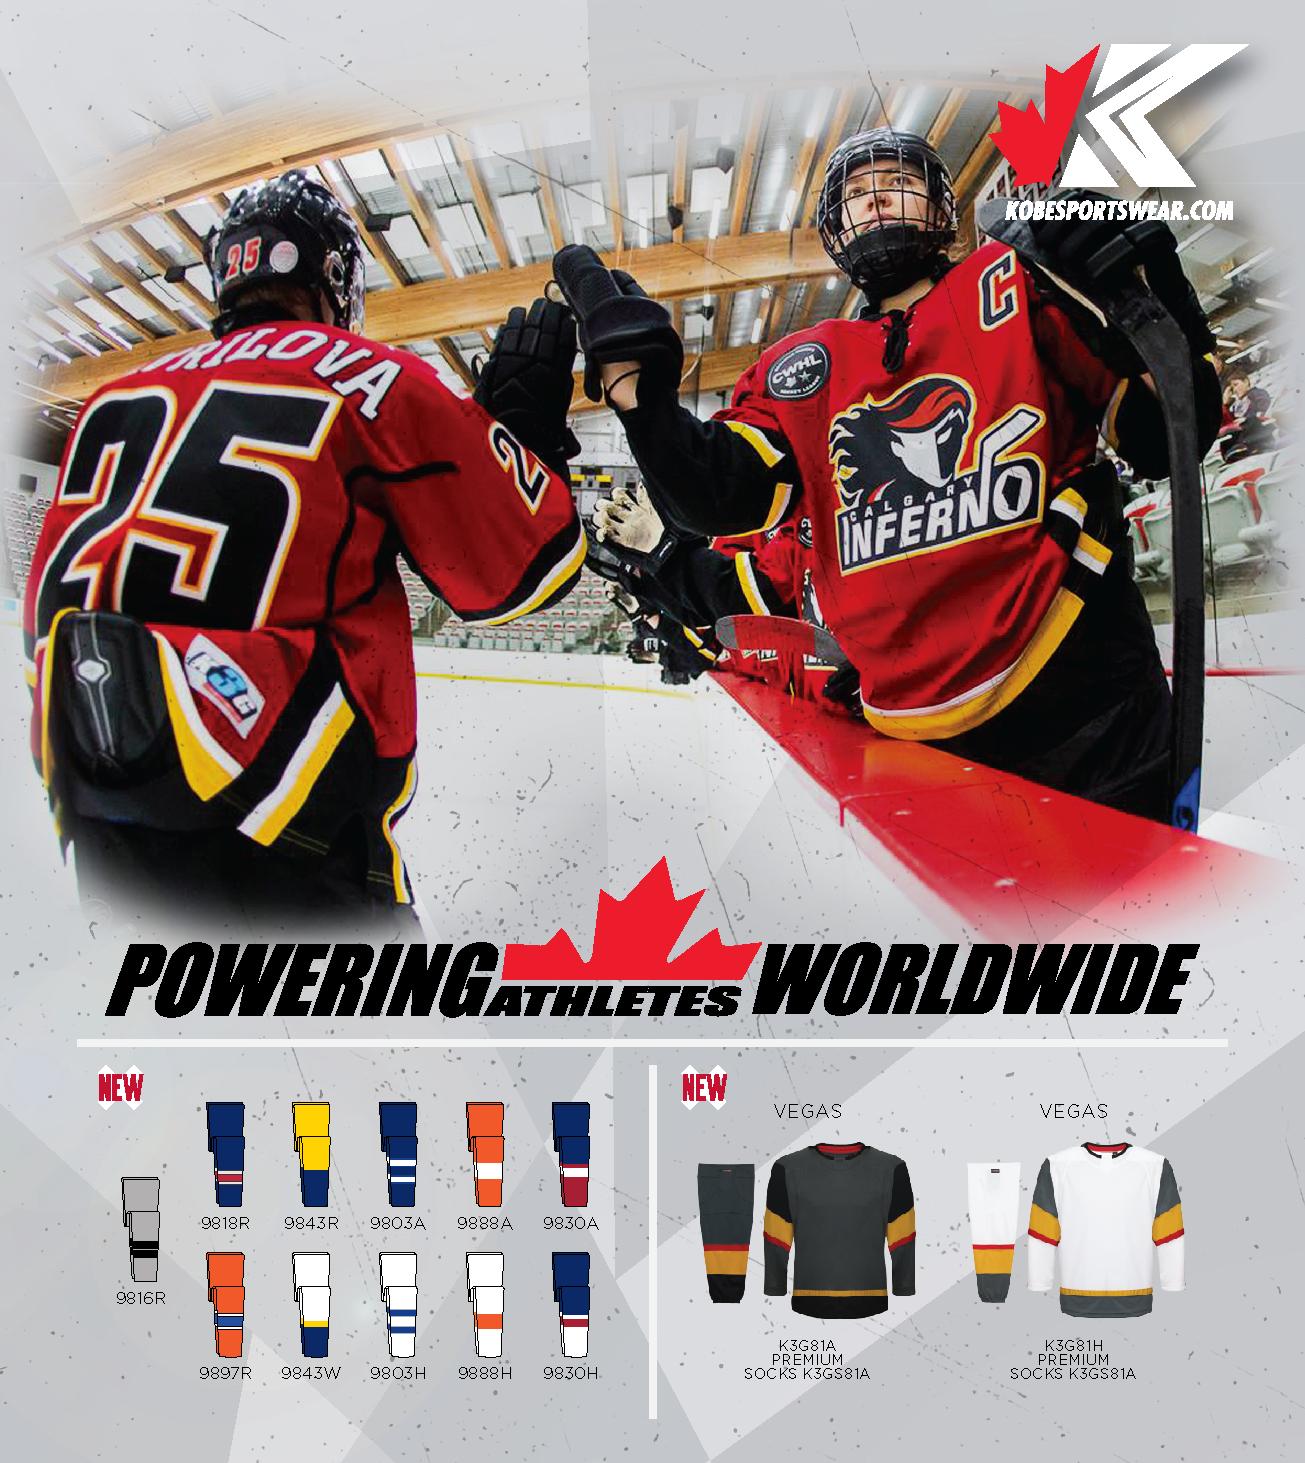 85fabc93890e 2018 19 Kobe Hockey Poster - Kobe Sportswear